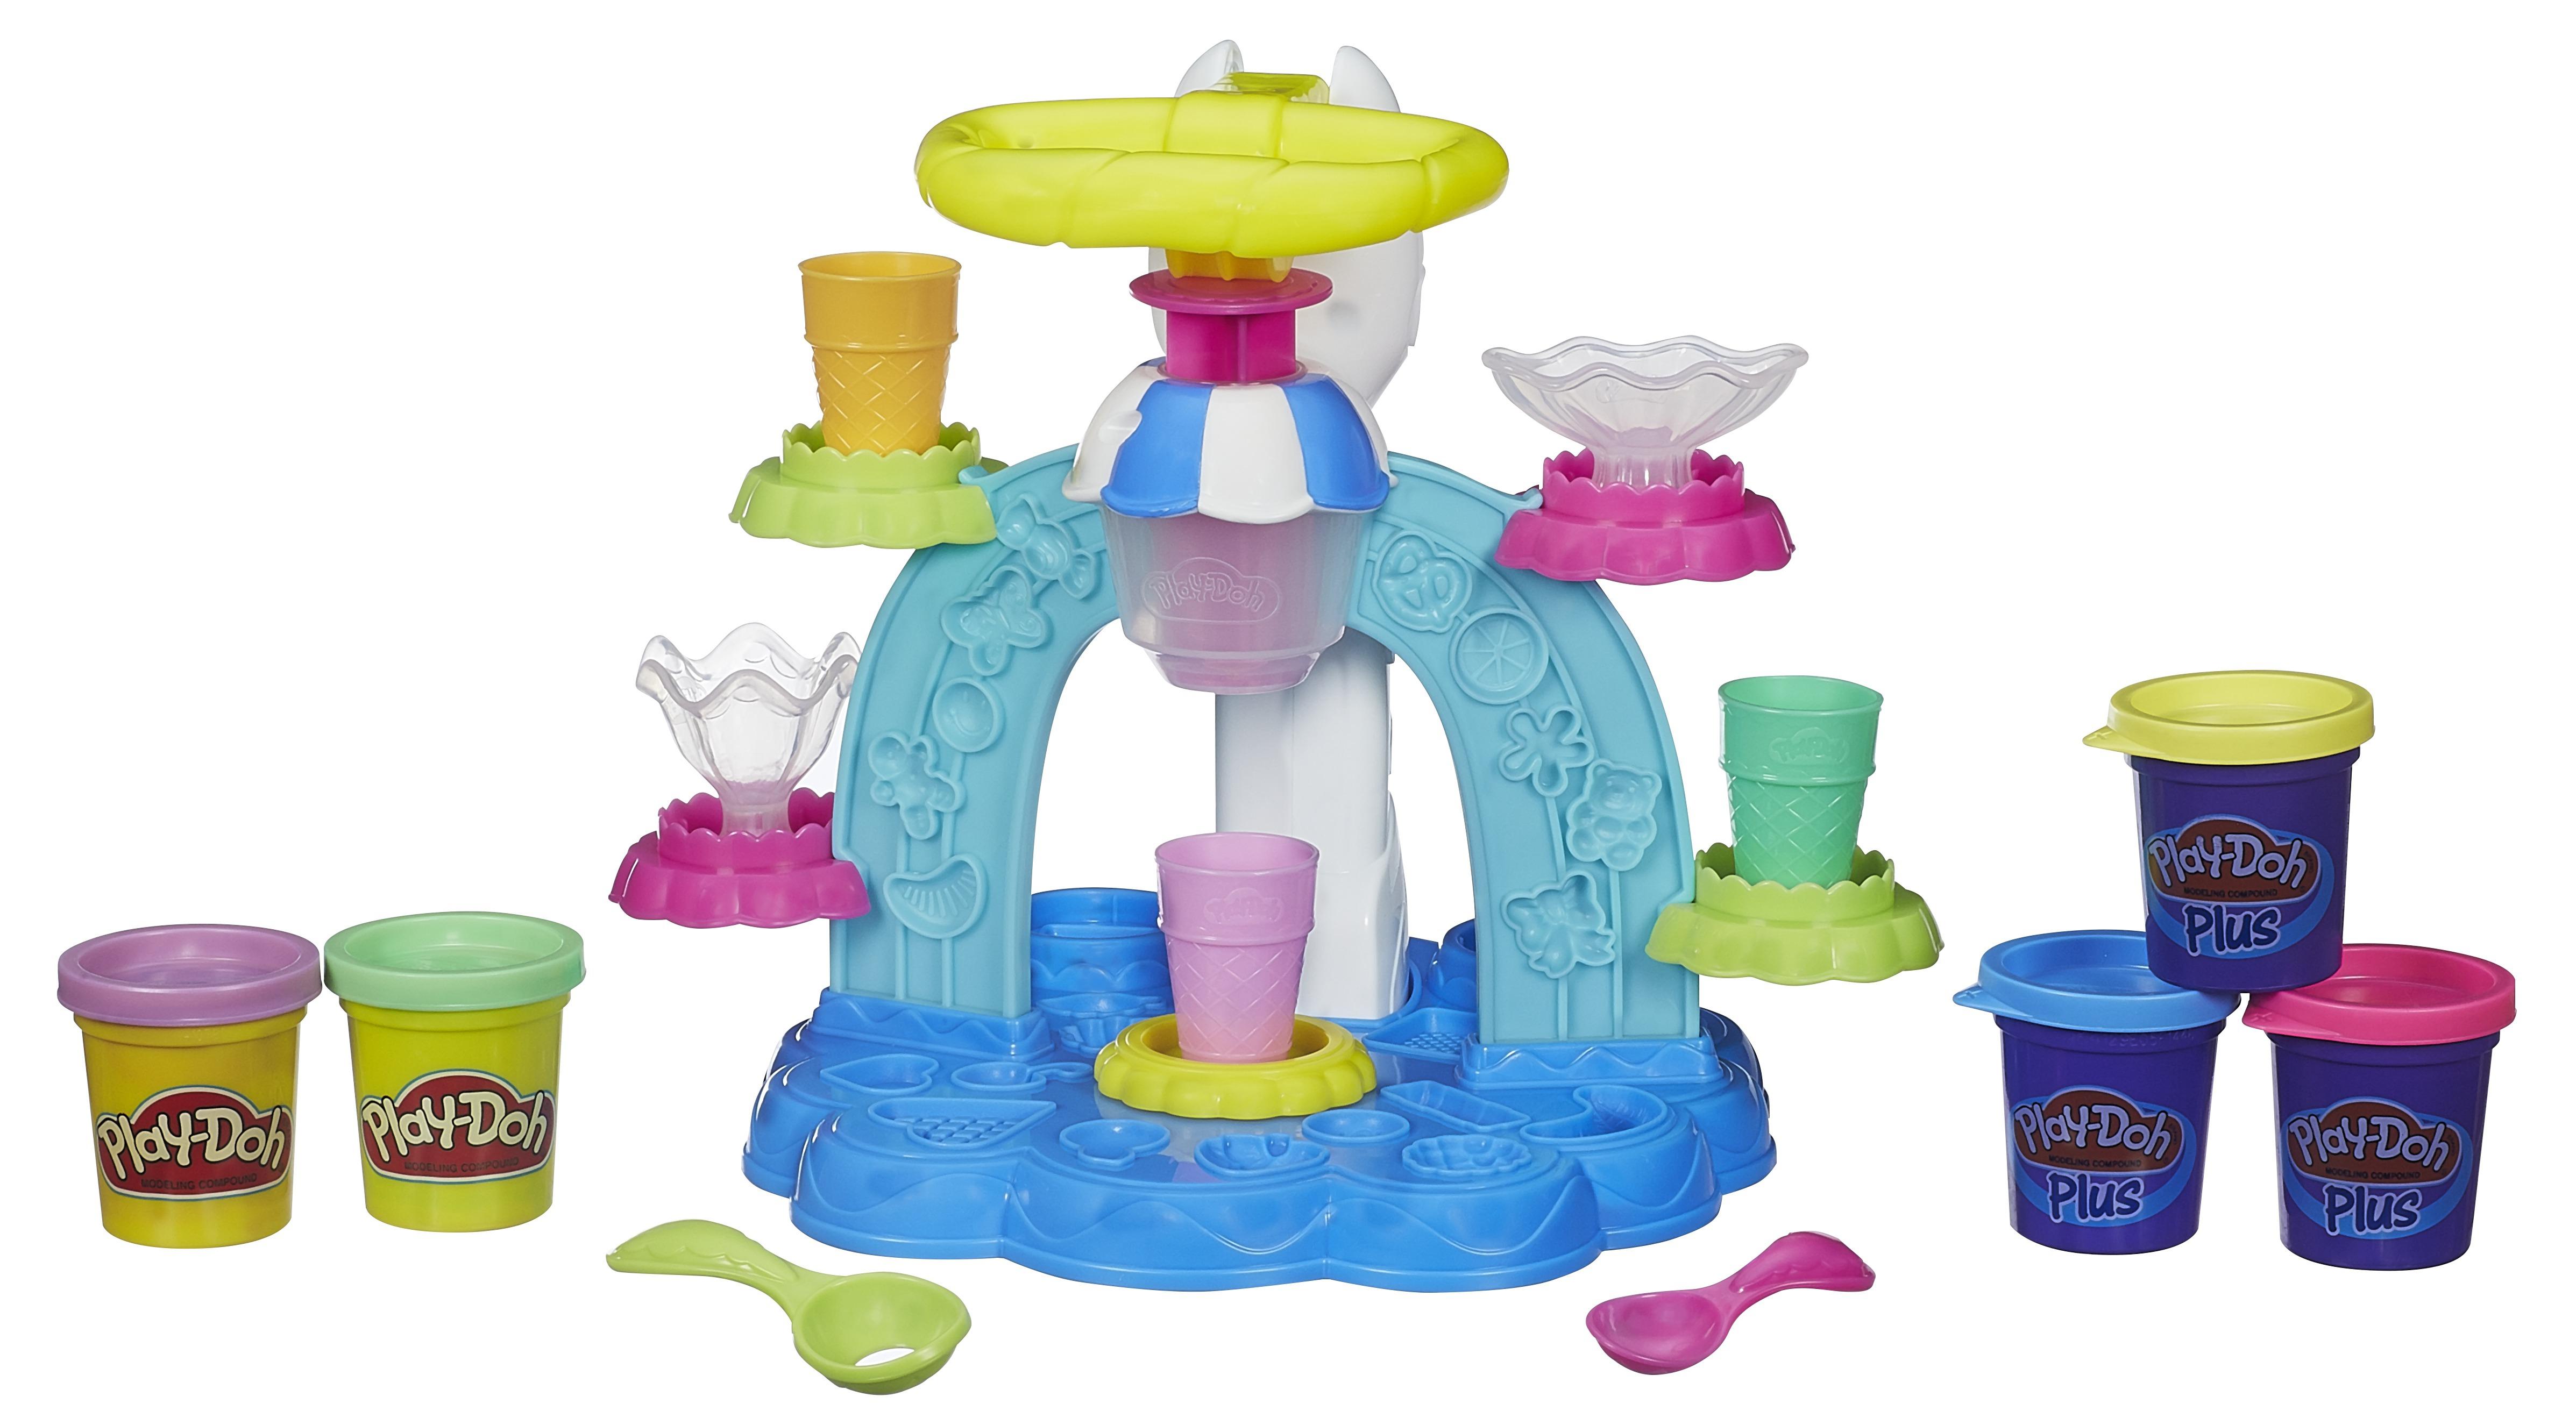 Купить Пластилин, Фабрика мороженого, Play-Doh, Китай